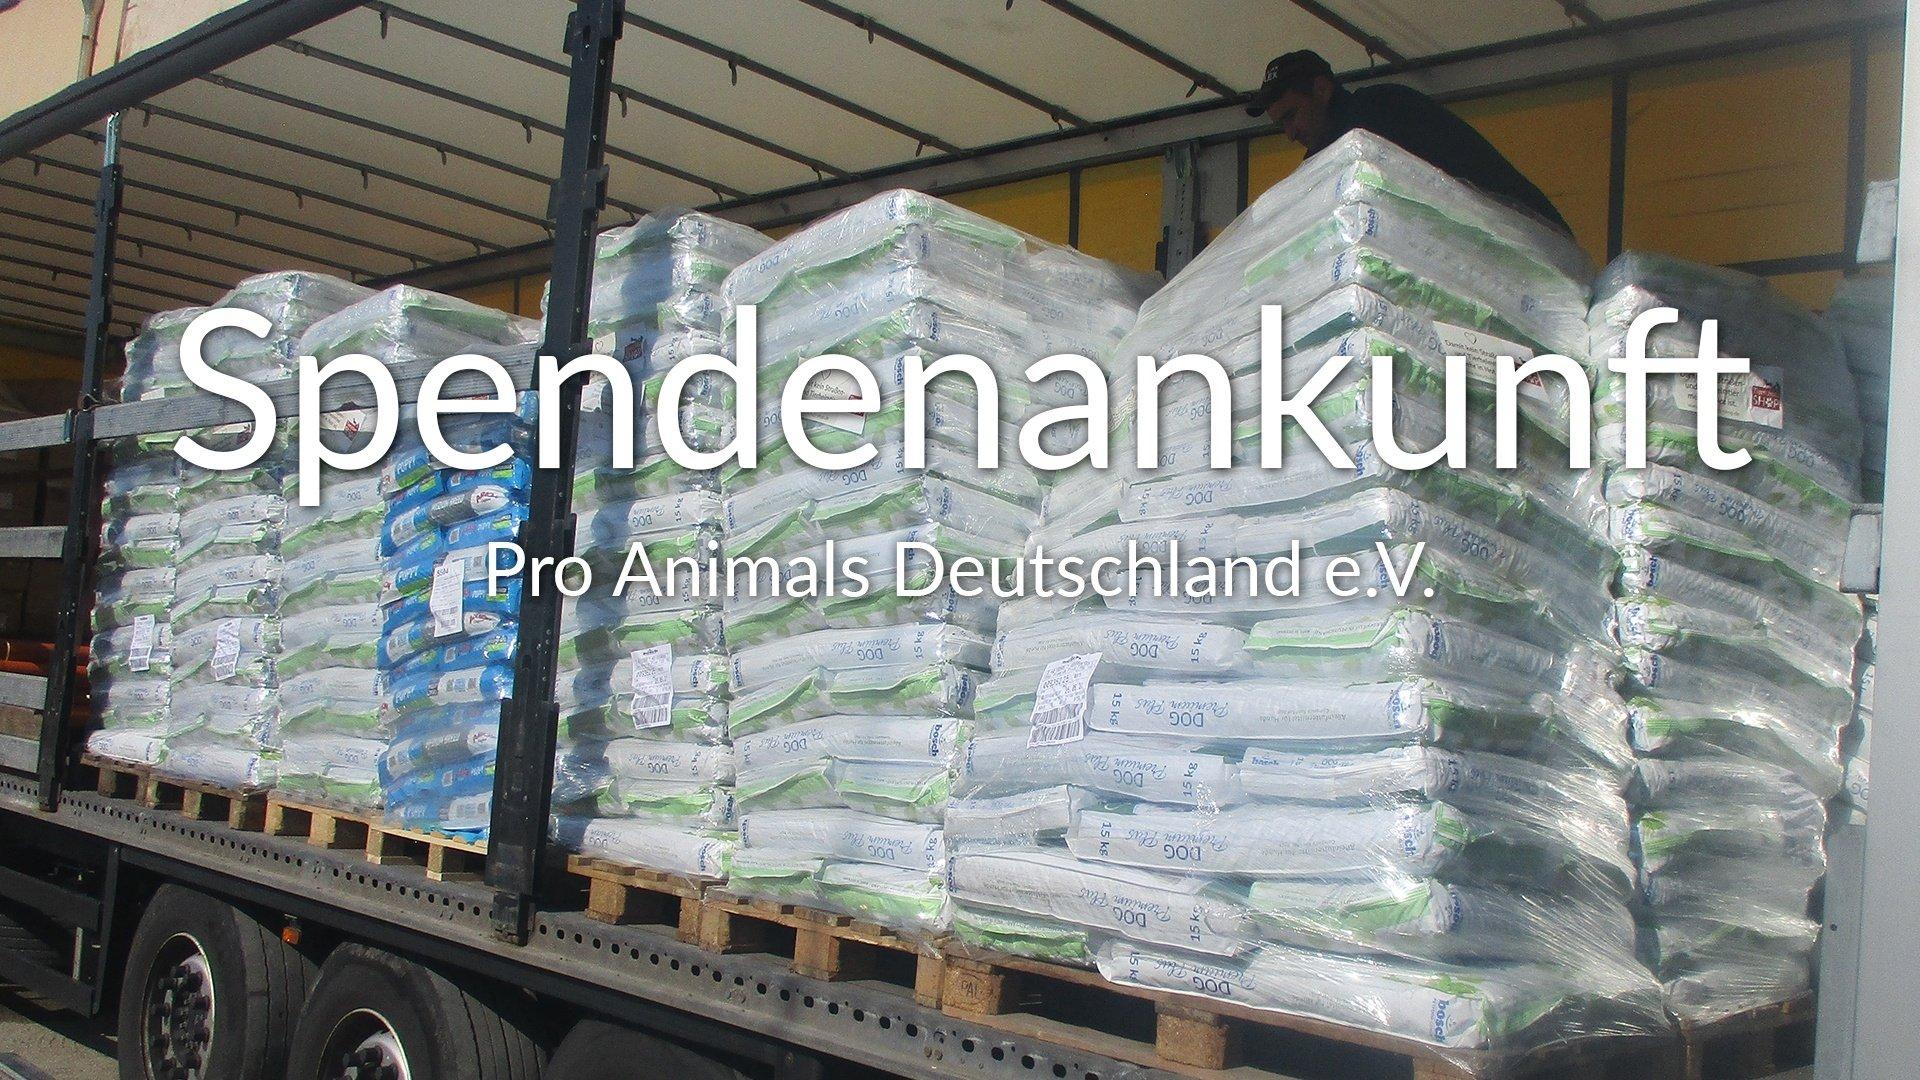 Pro Animals Deutschland e.V.-Notfallhilfe-Corona-Rumänien-VIDEO